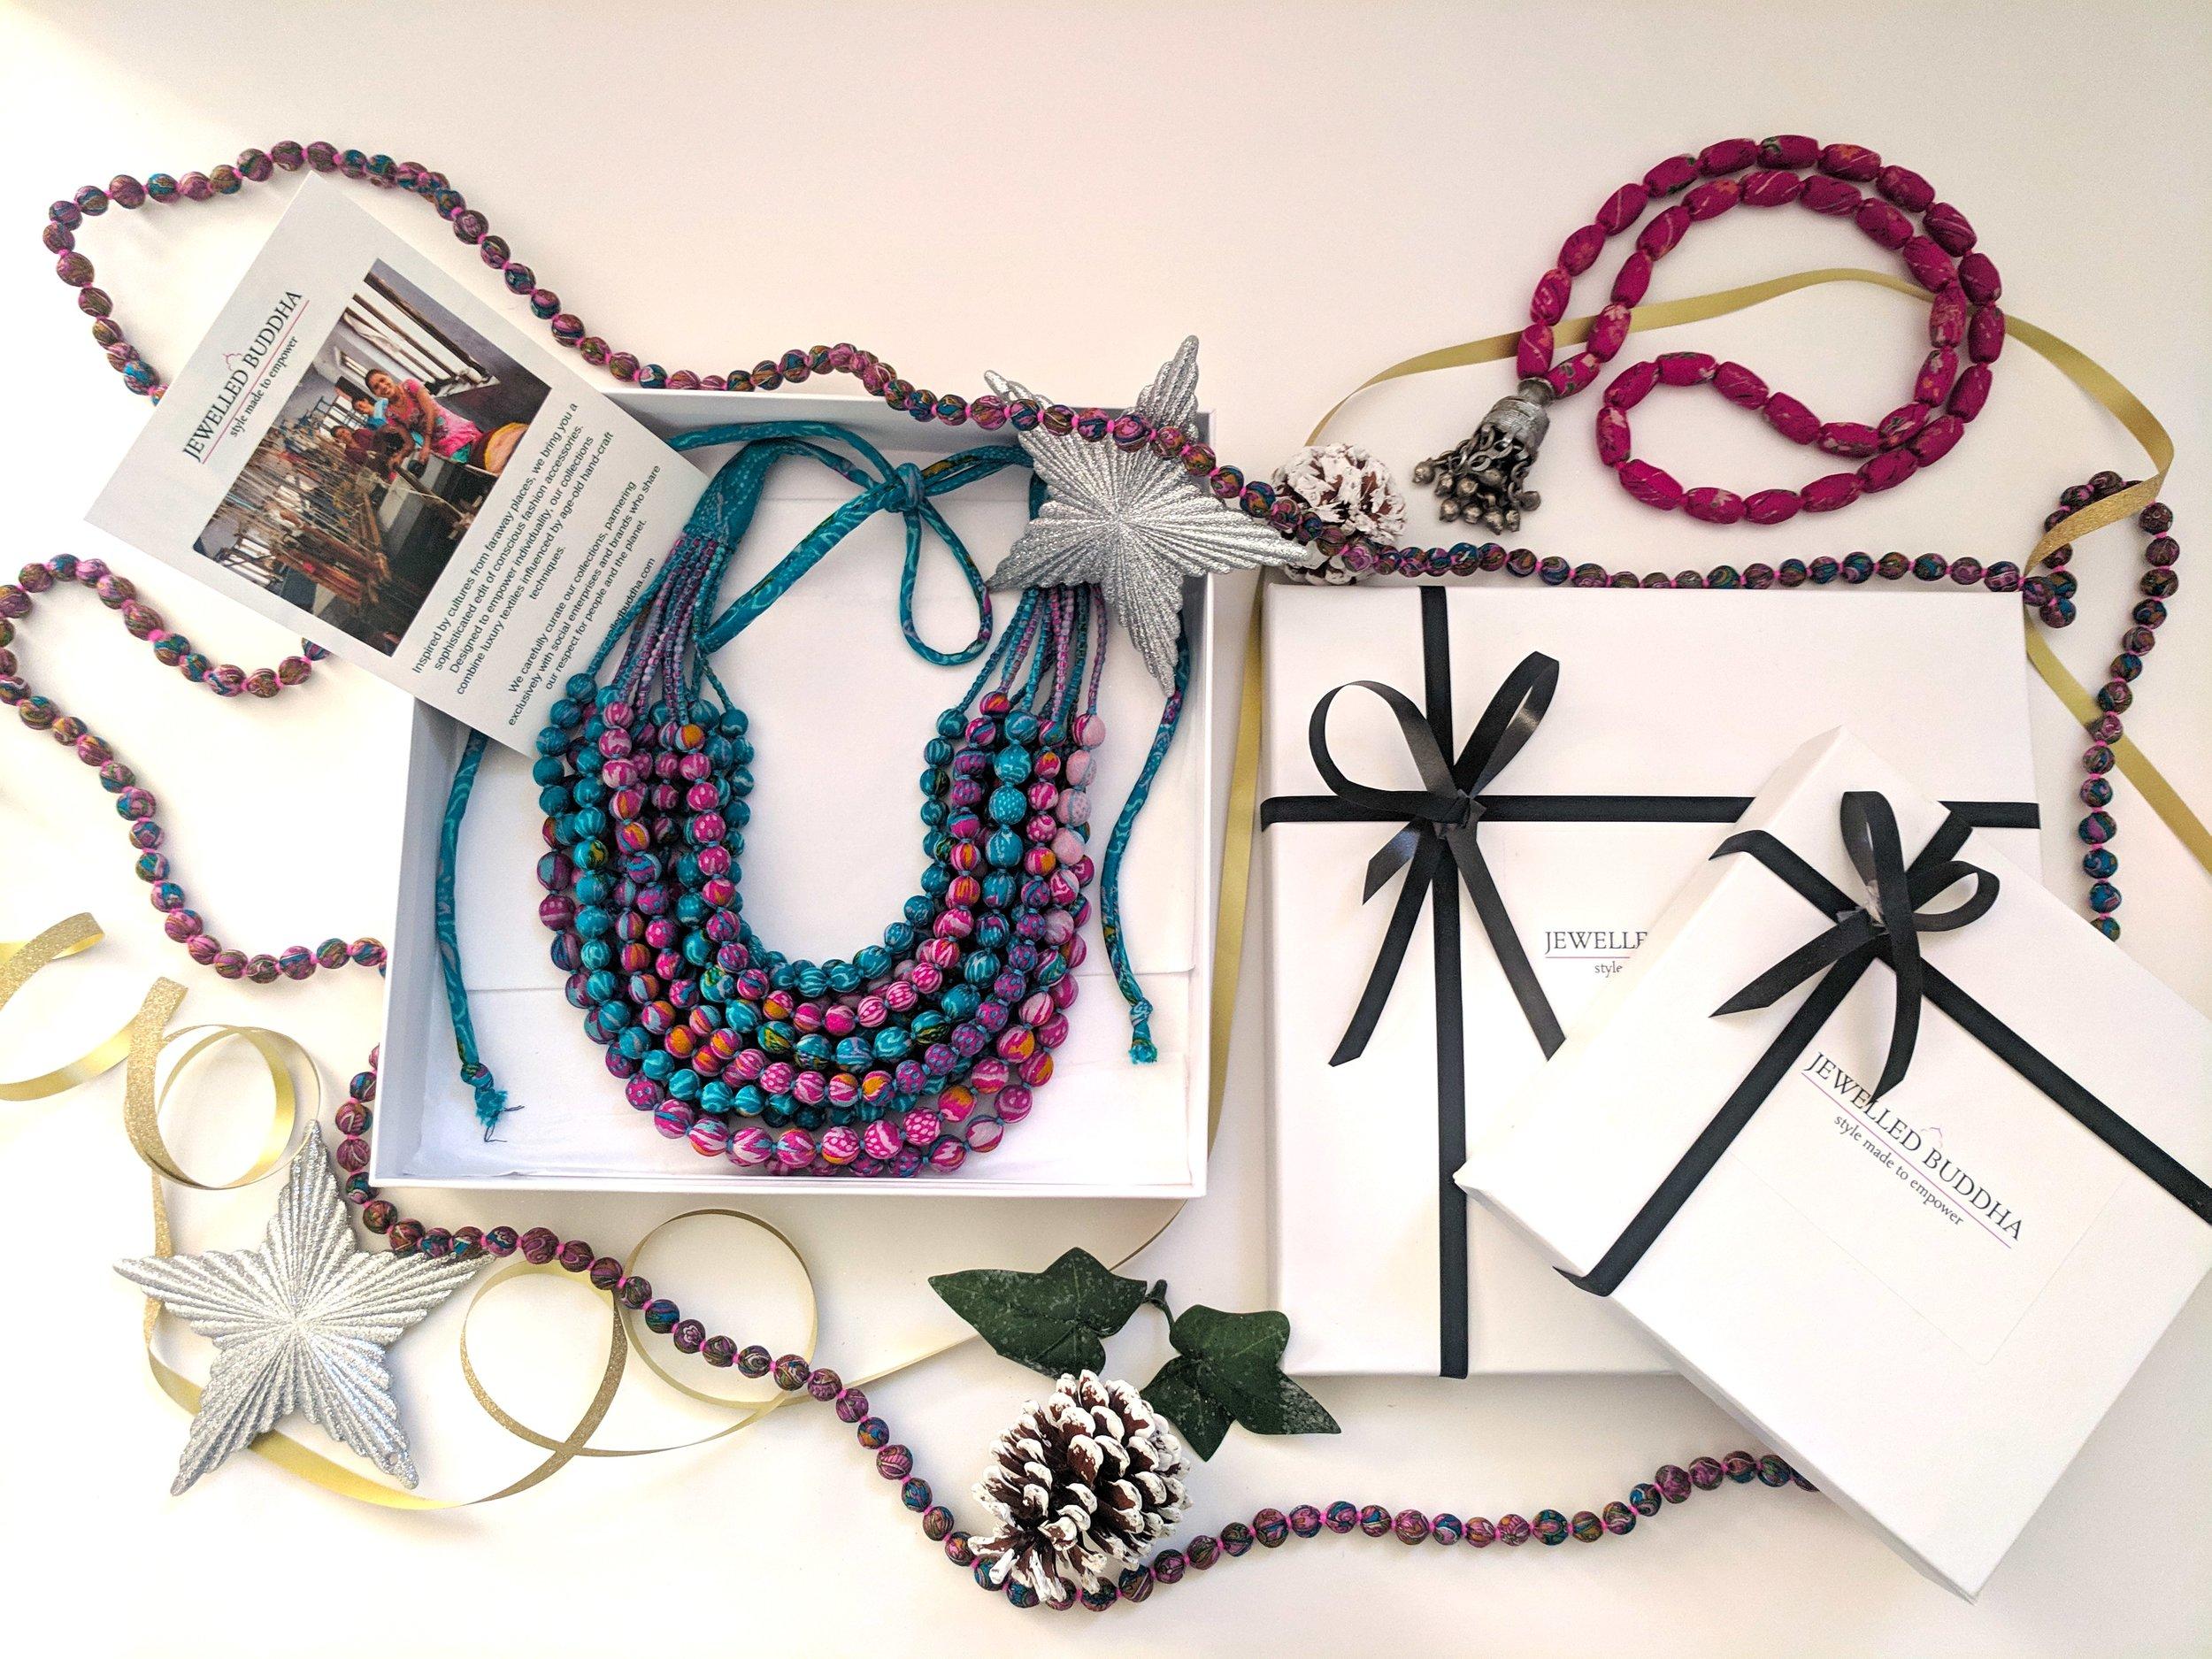 sari necklace in Gift box.jpg